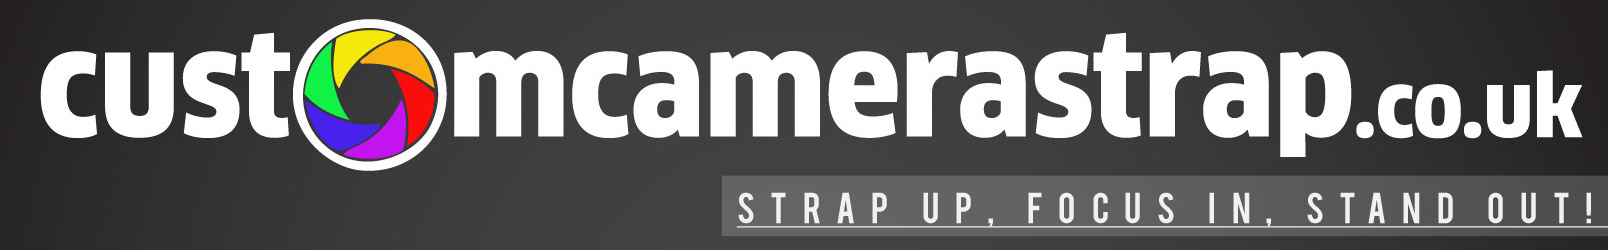 Custom Camera Strap – design your own personalised DSLR camera neck strap